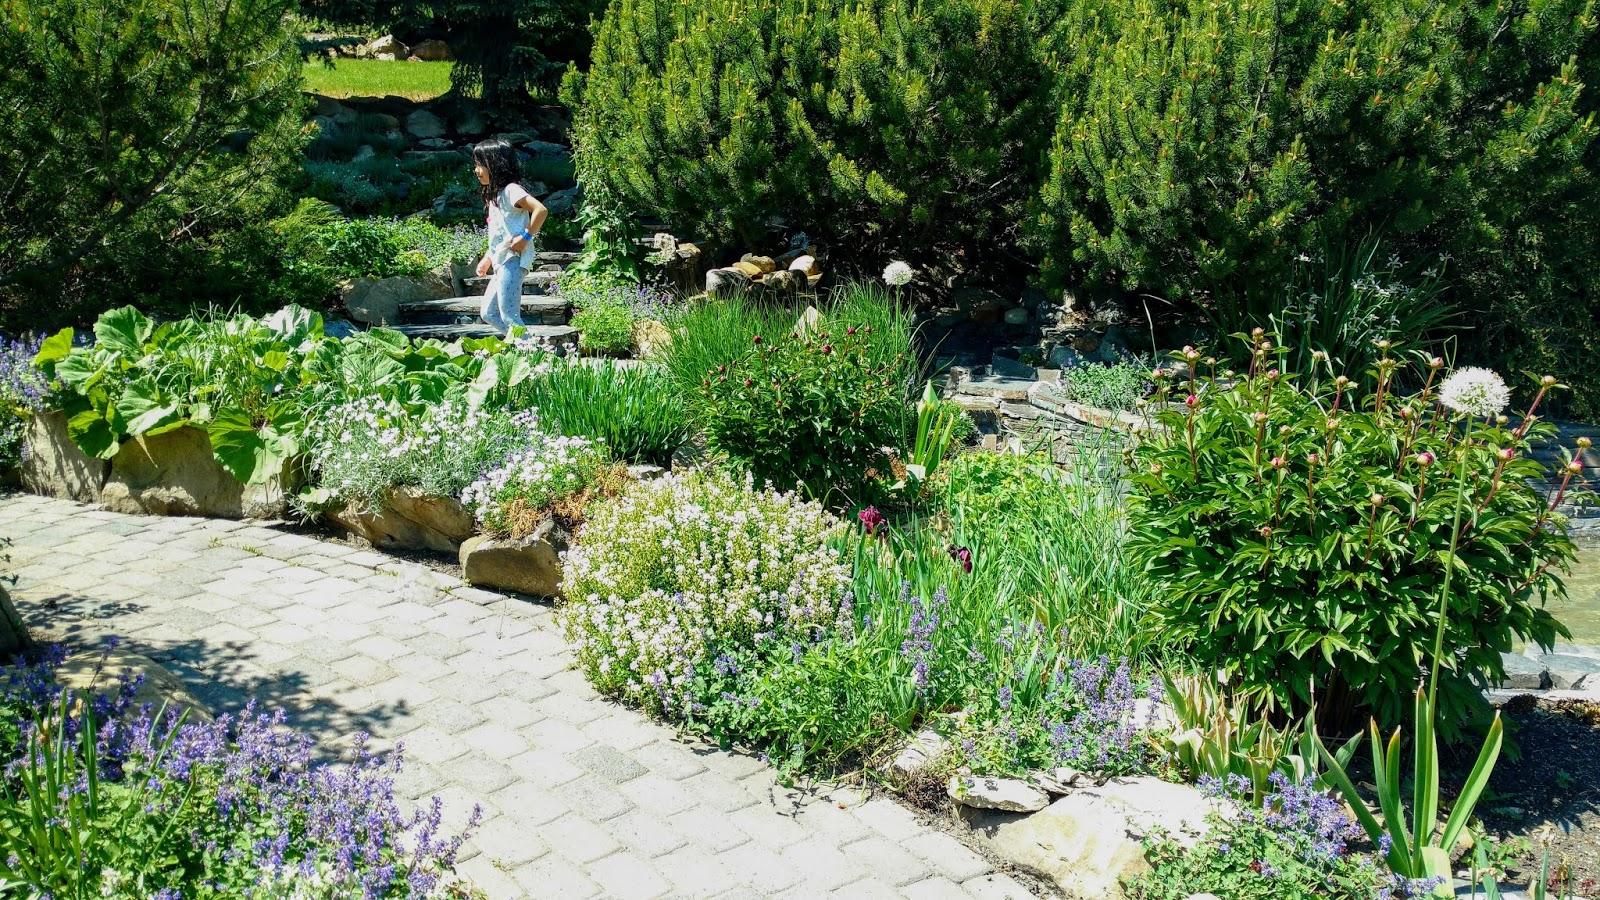 Senator Patrick Burns Memorial Rock Garden